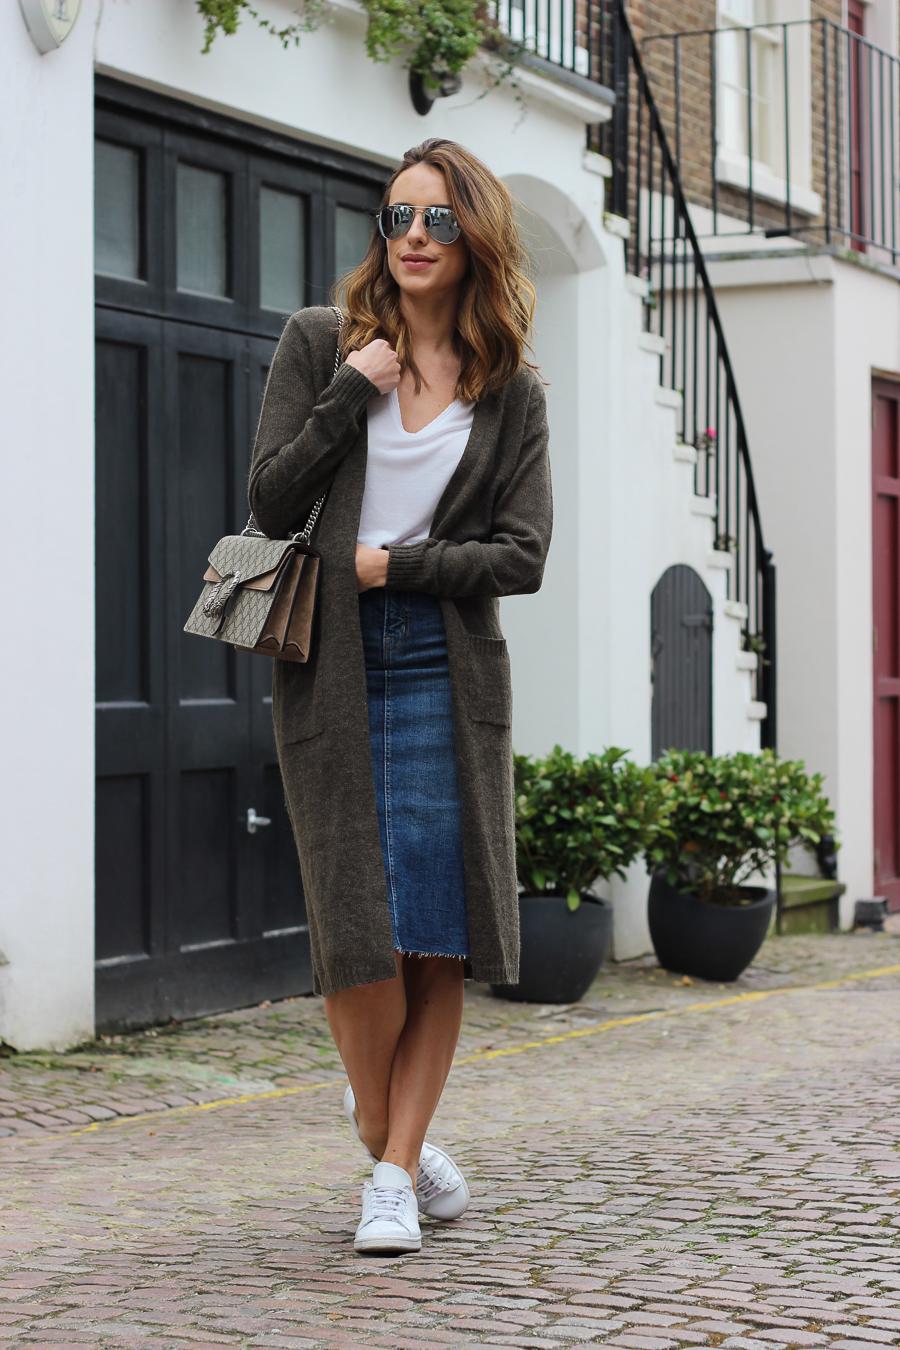 Clutch and carry on - uk fashion blogger - uk travel blogger - sabrina chakici - matalan cardigan, zara denim midi skirt, gucci dionysus supreme-5